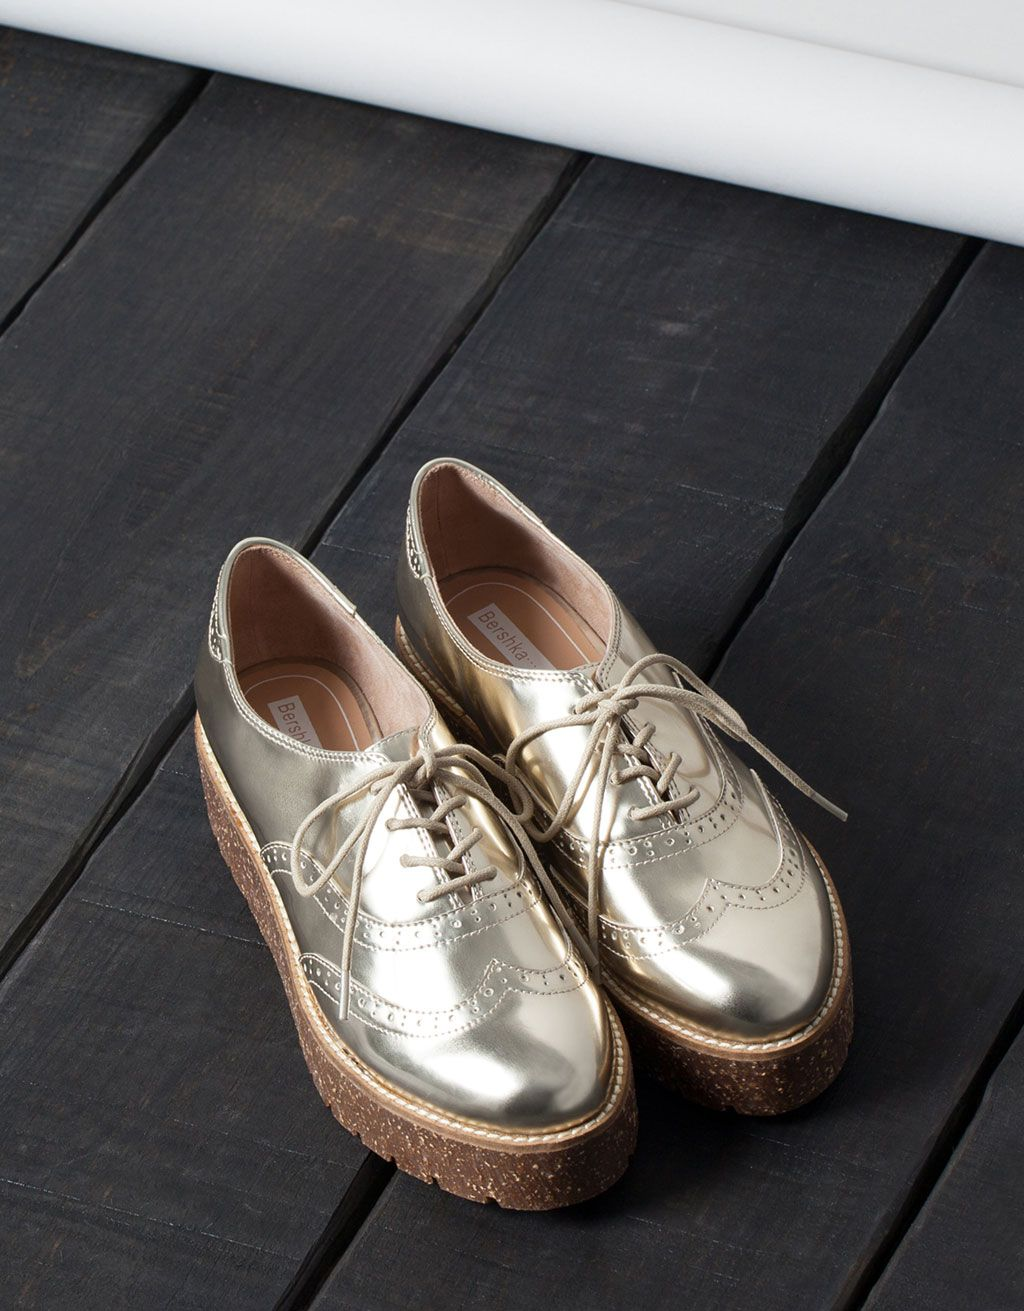 Sapato com pontos Bershka - Tudo - Bershka Portugal